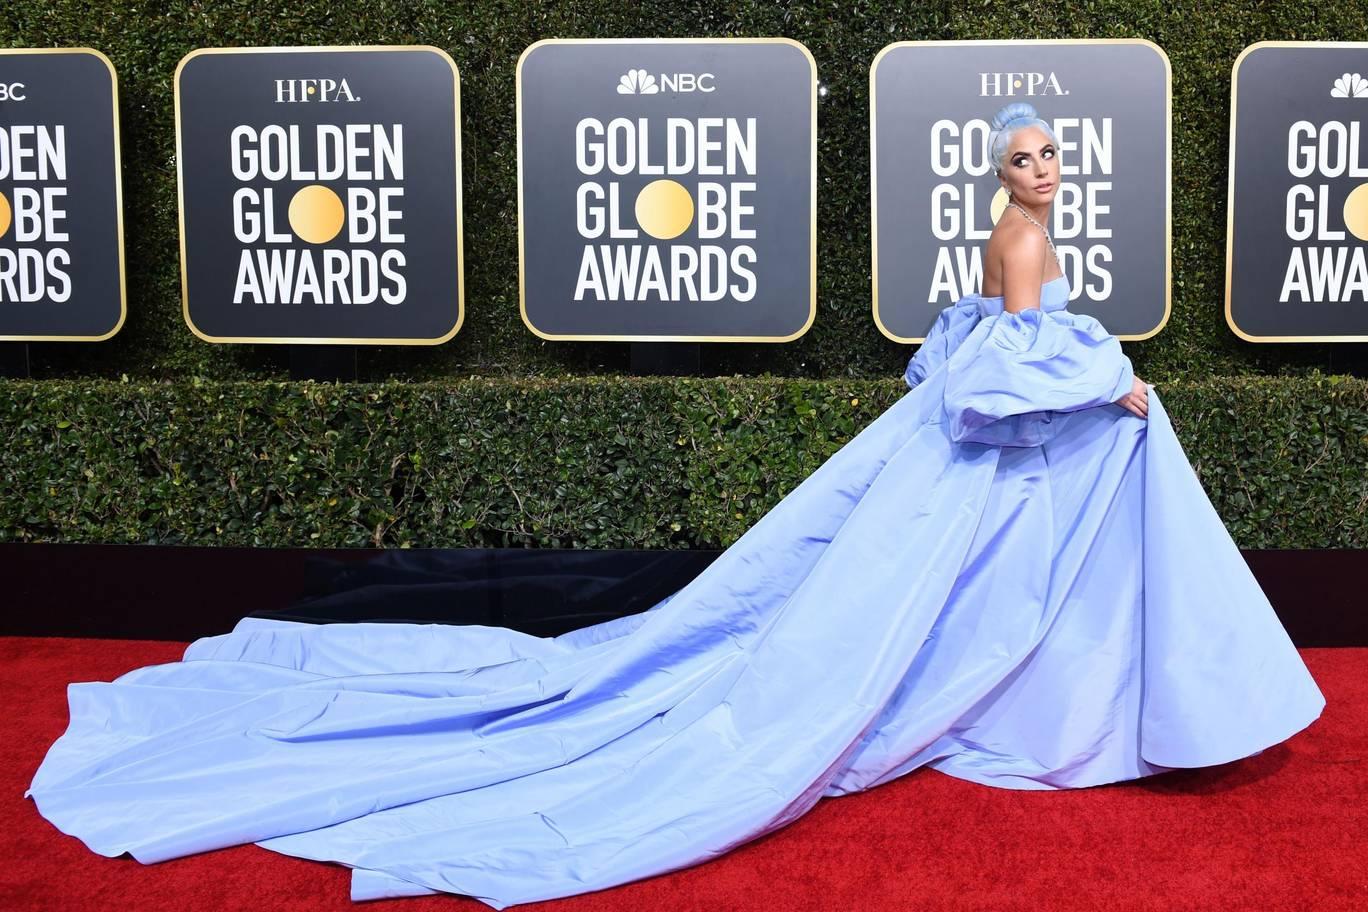 bestdressedheadergoldenglobes - 76th Golden Globes- who wore what!!